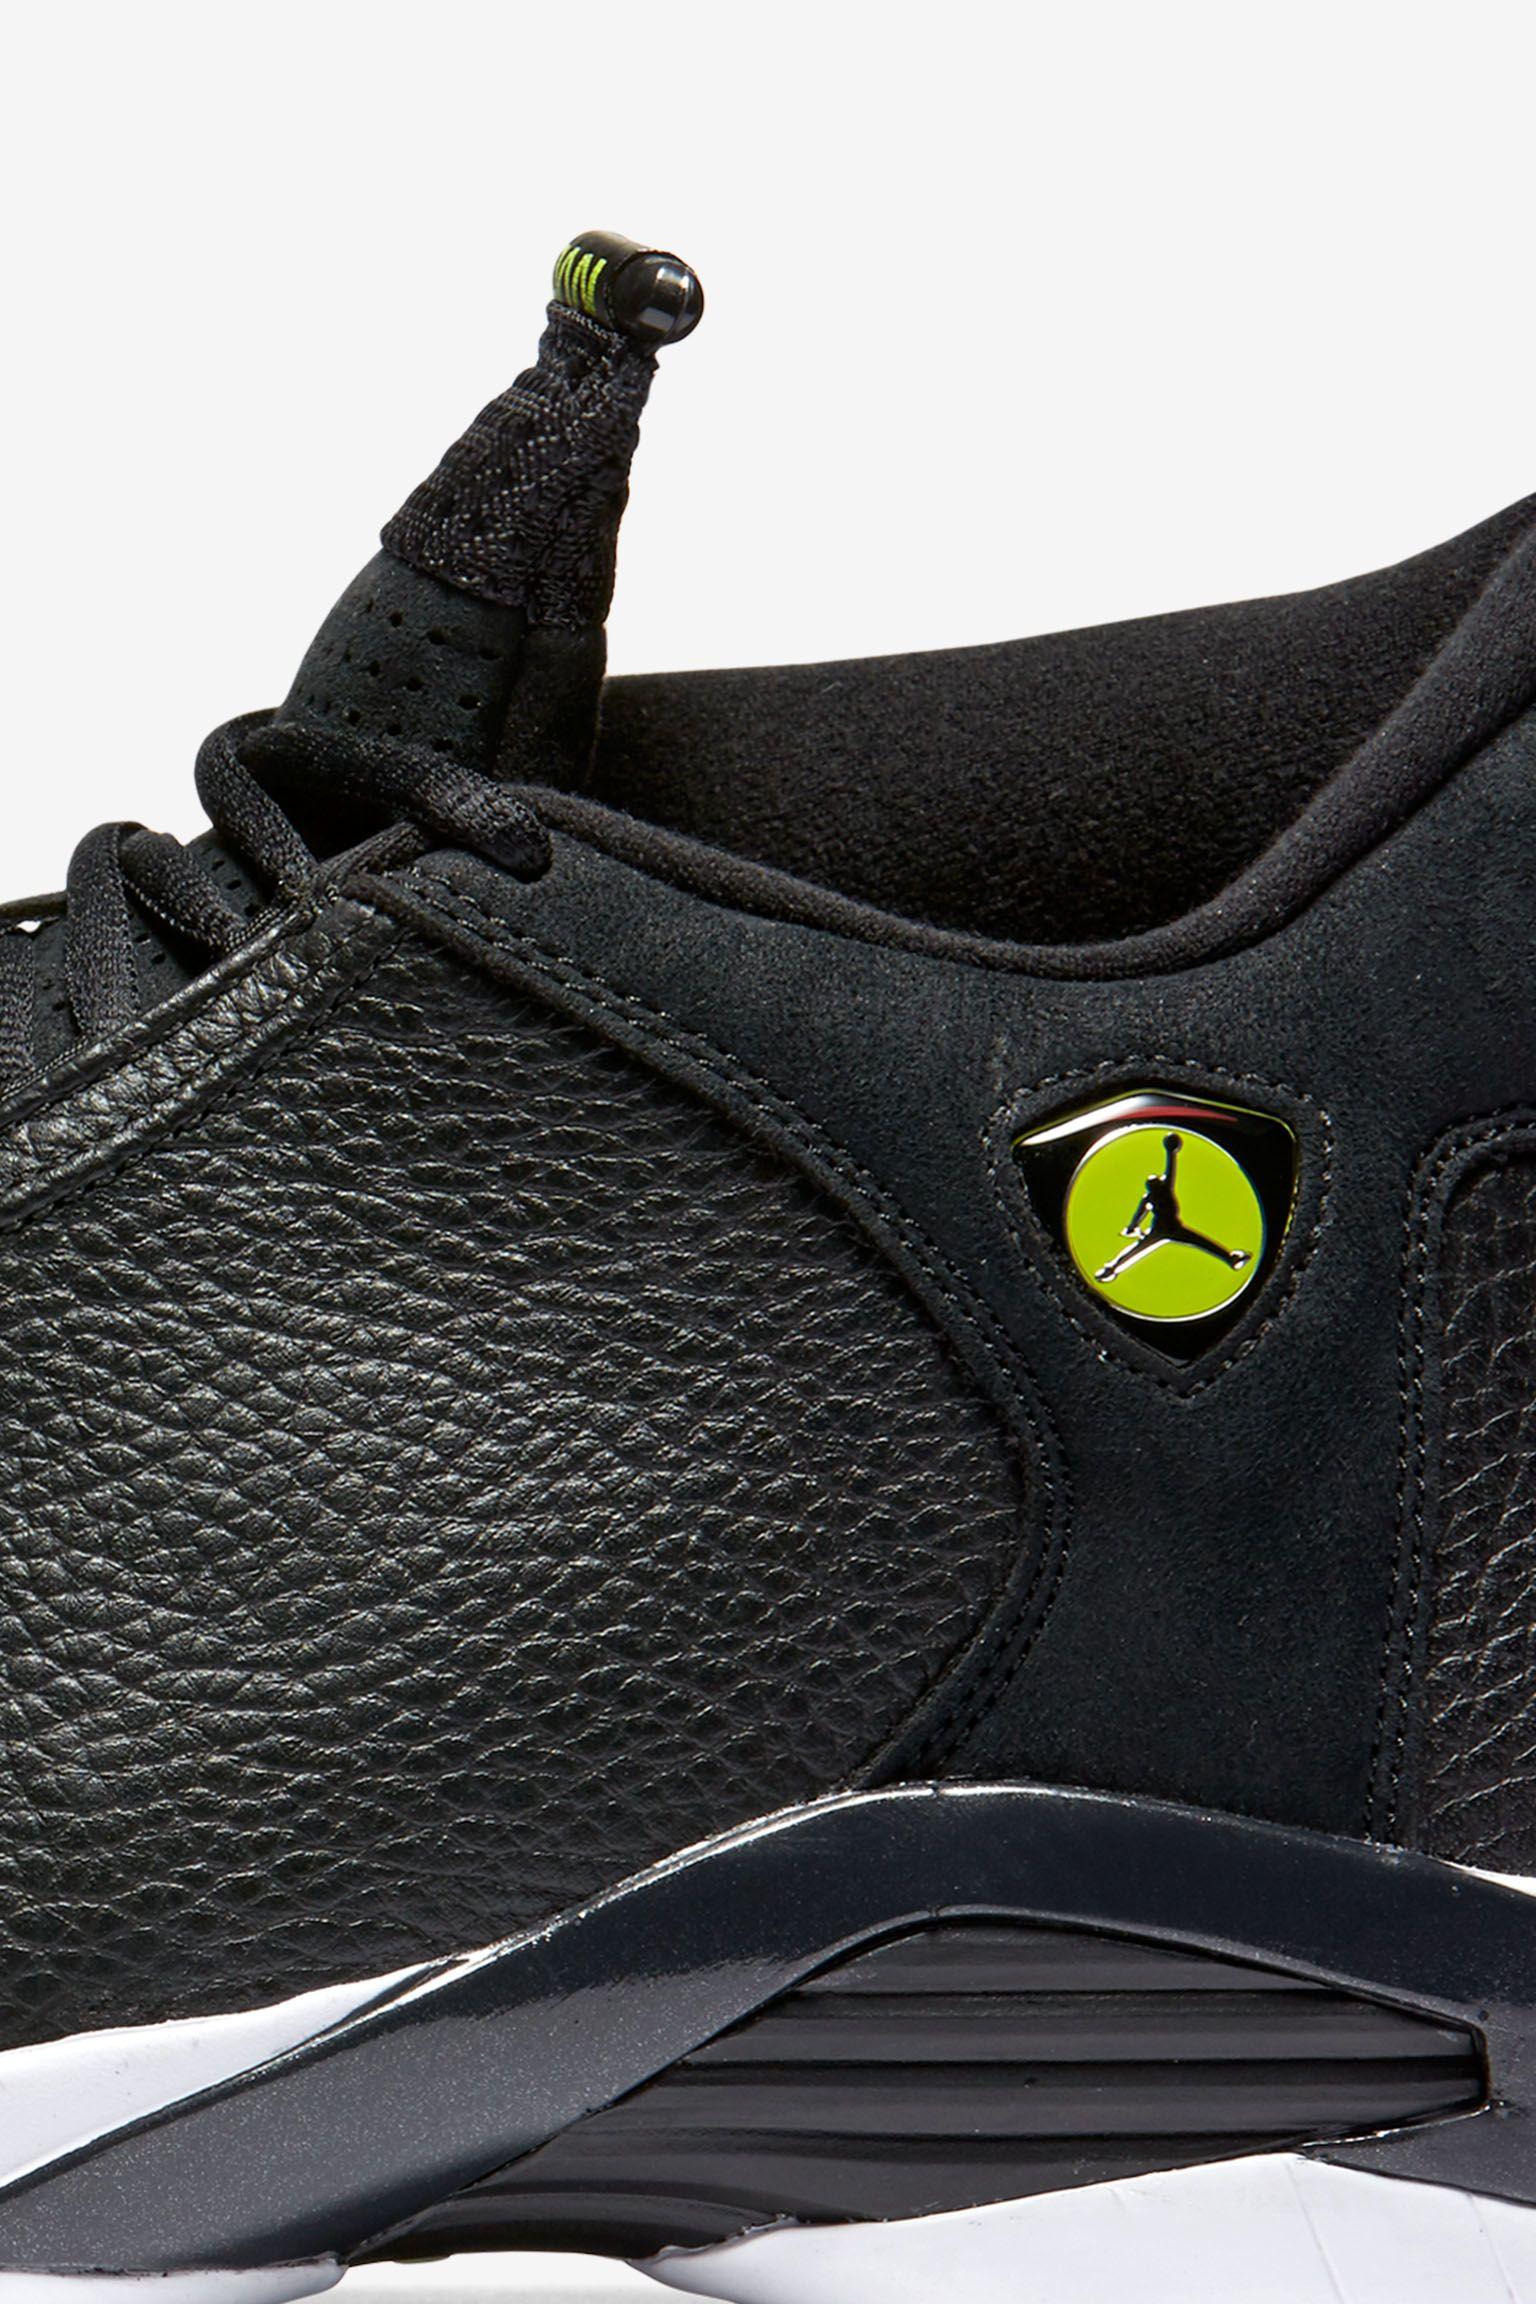 f54c631a0a1ac7 Air Jordan 14 Retro  Indiglo  Release Date. Nike+ SNKRS